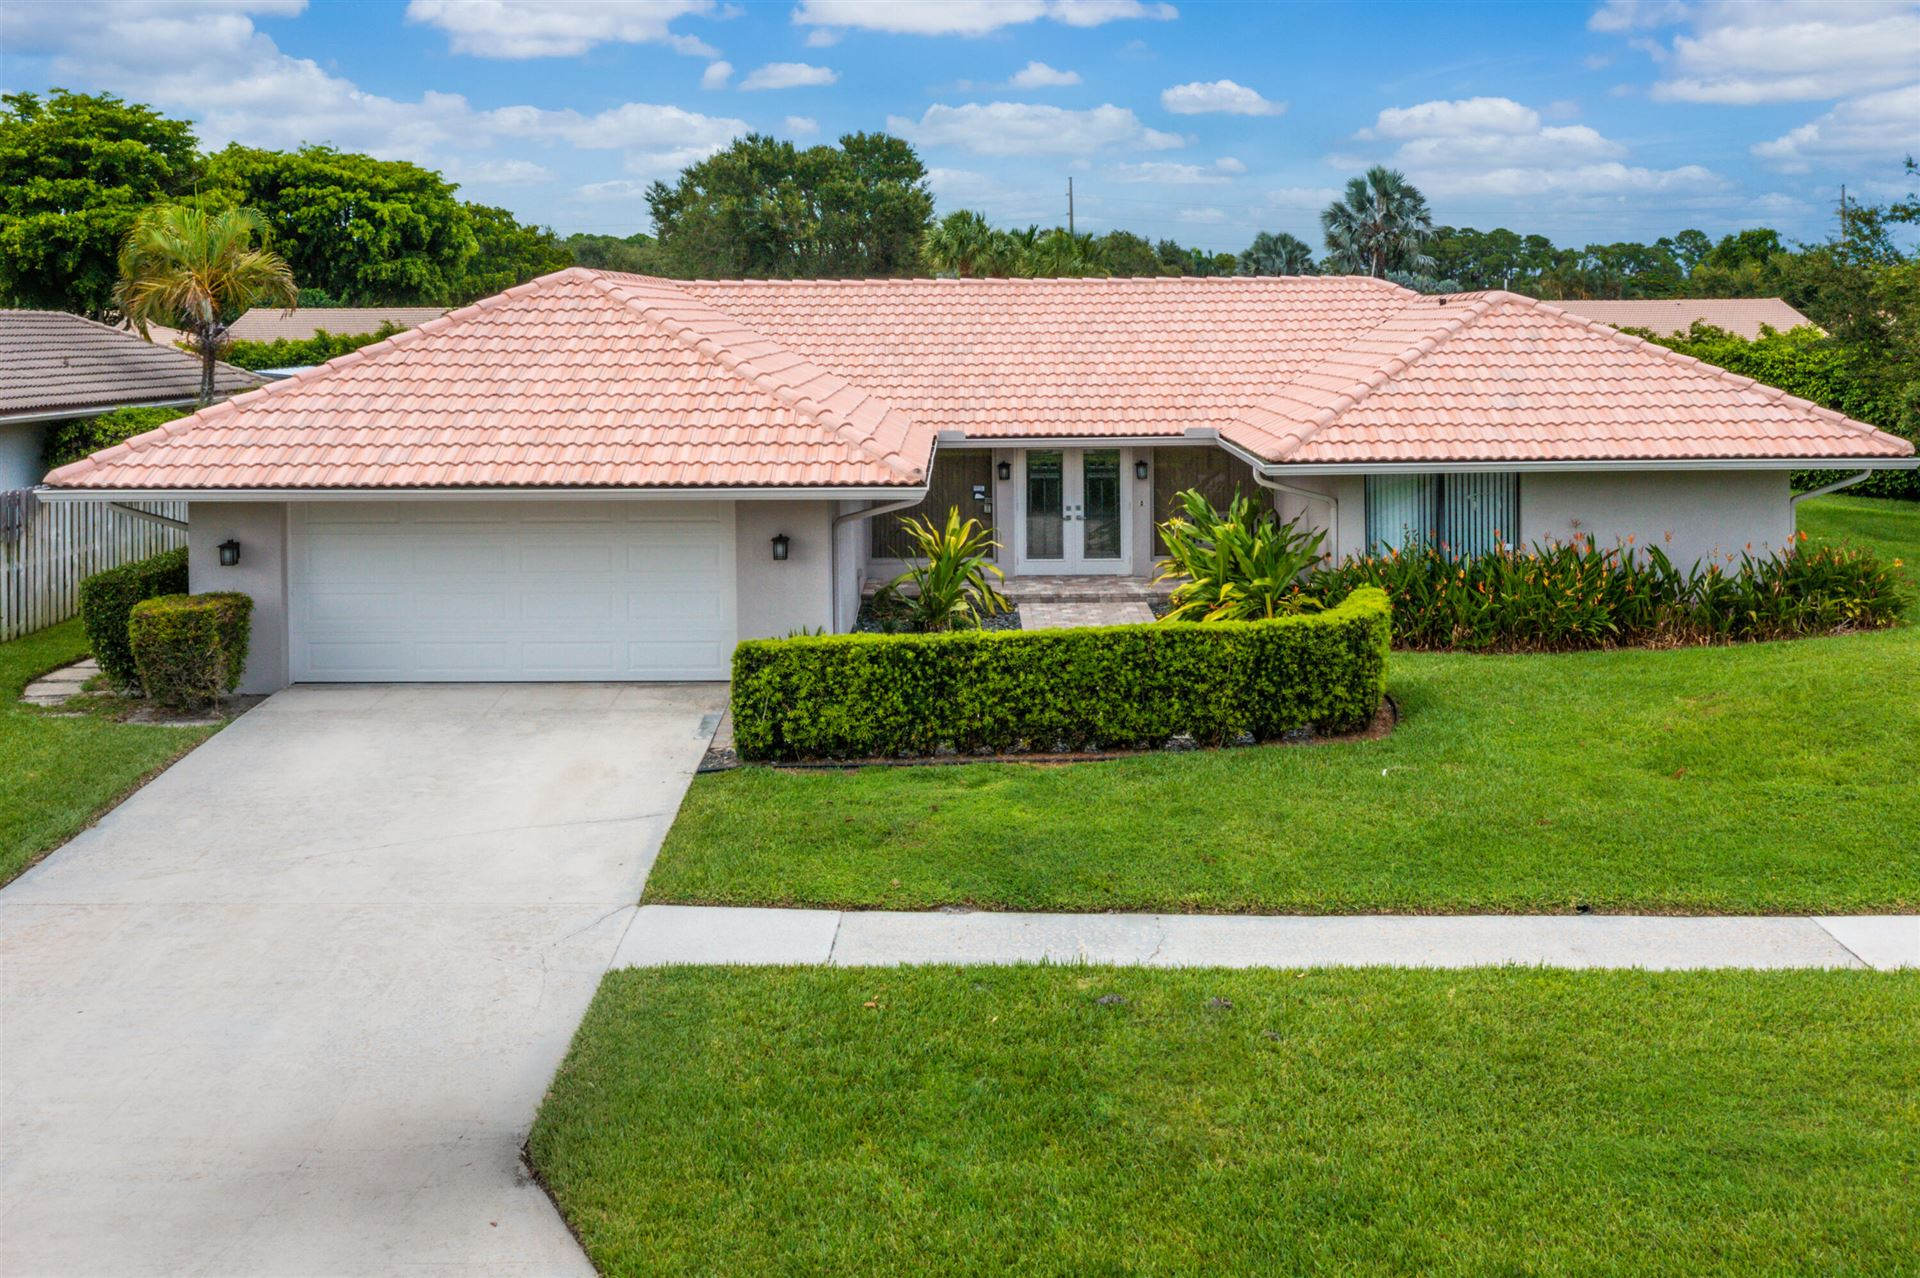 5875 Glenbrook Drive, Boca Raton, FL 33433 - MLS#: RX-10744958